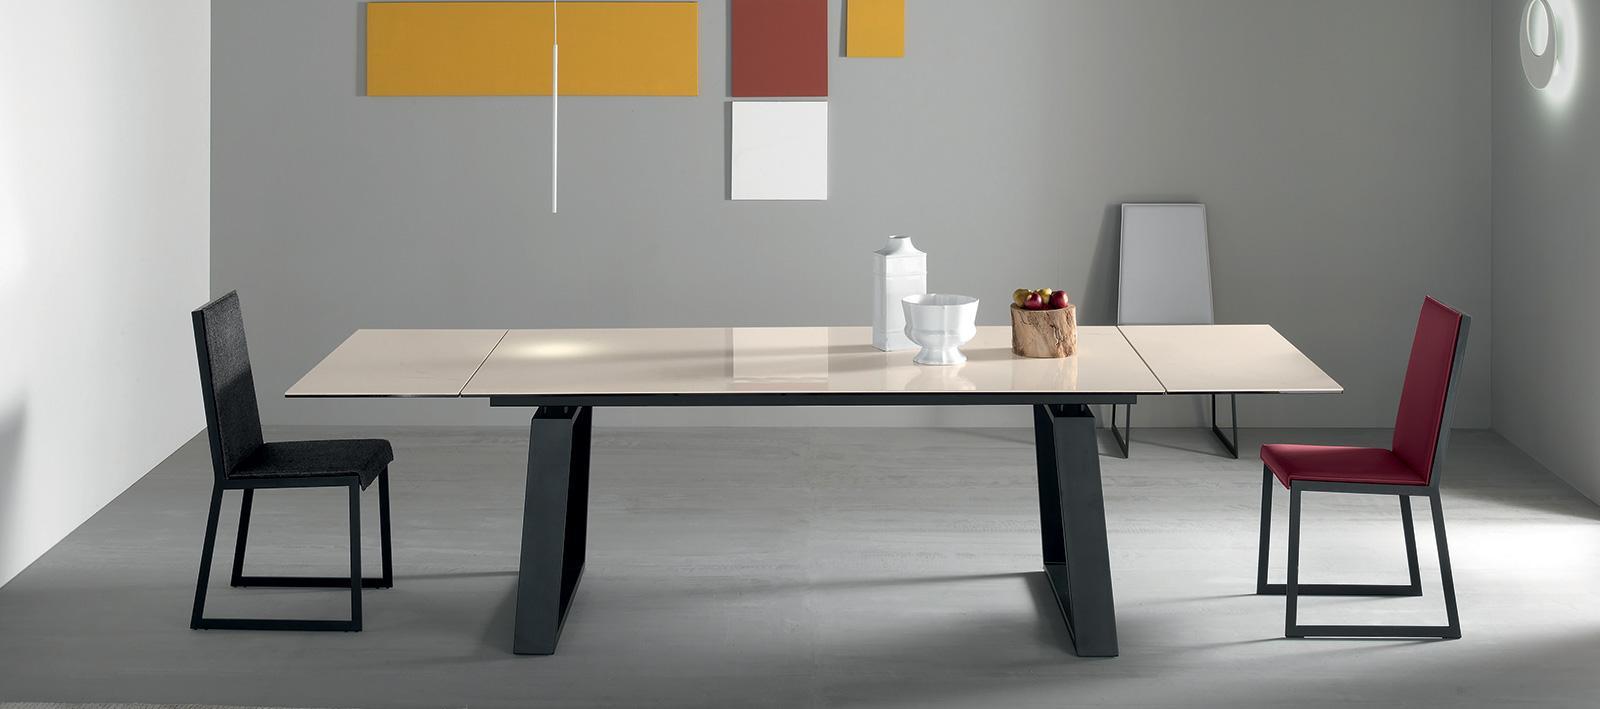 Table En Cramique Extensible Vente En Ligne Italy